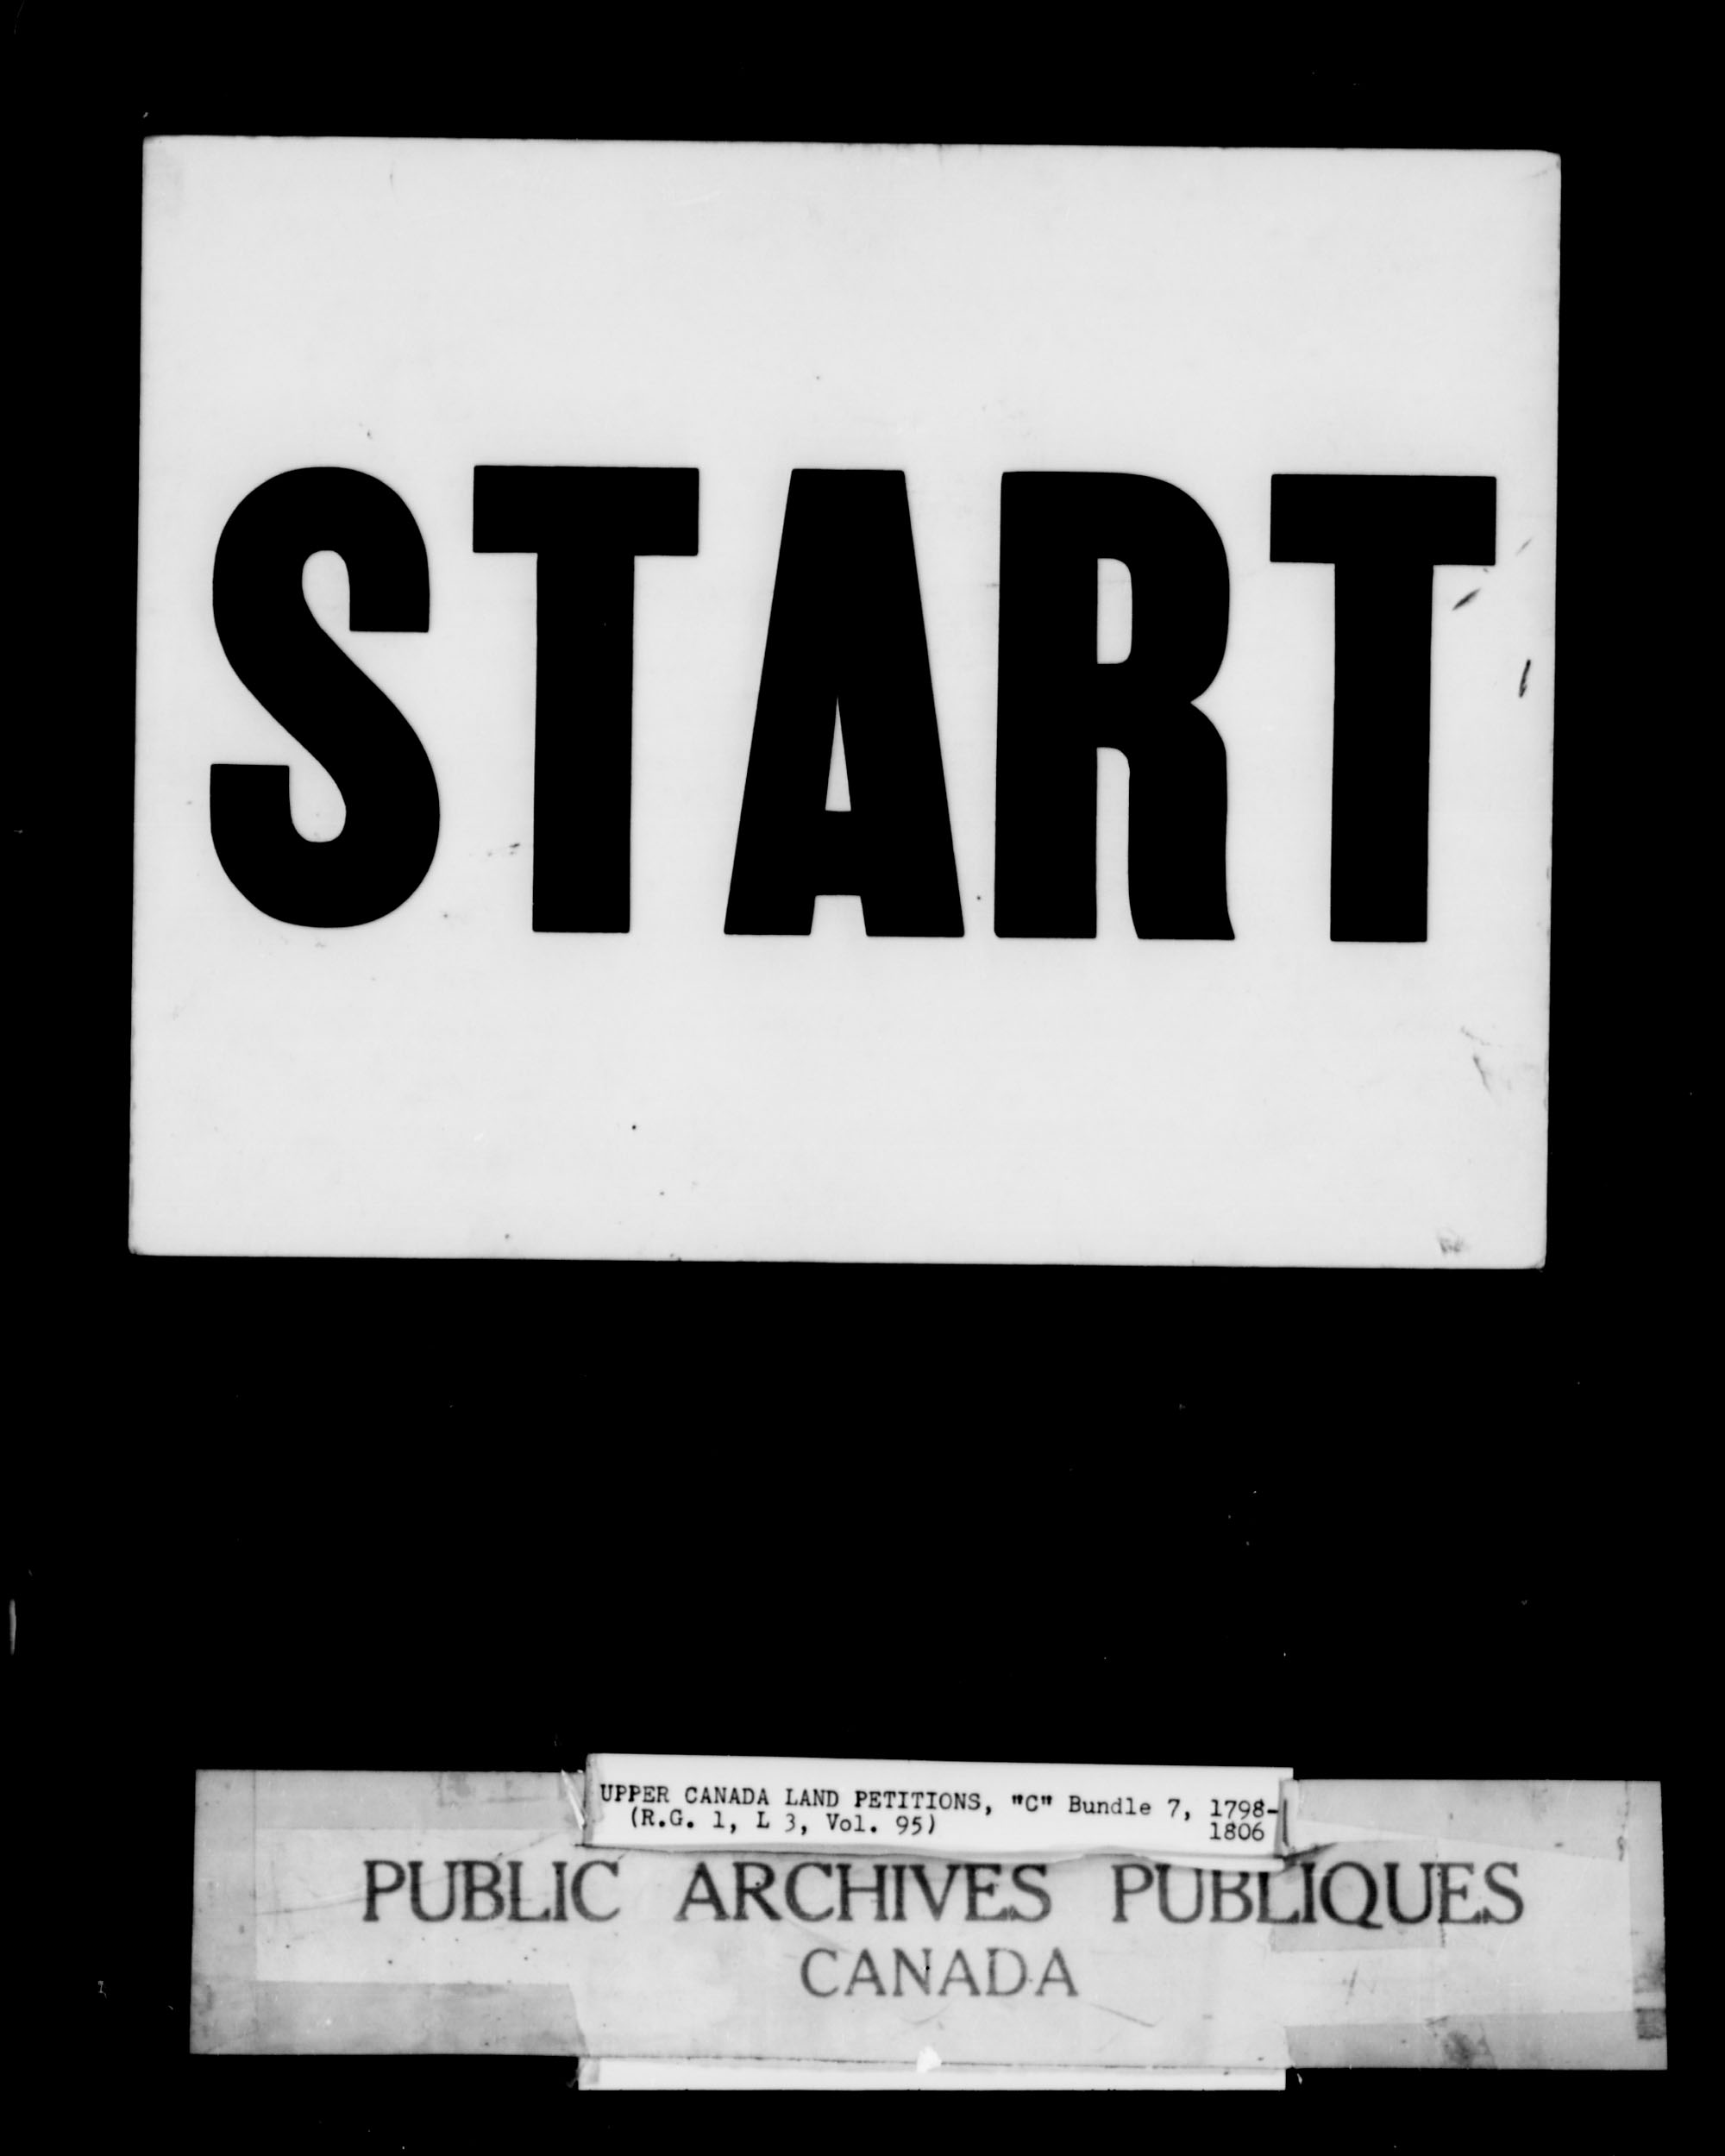 Titre: Demandes de terres du Haut-Canada (1763-1865) - N° d'enregistrement Mikan: 205131 - Microforme: c-1650